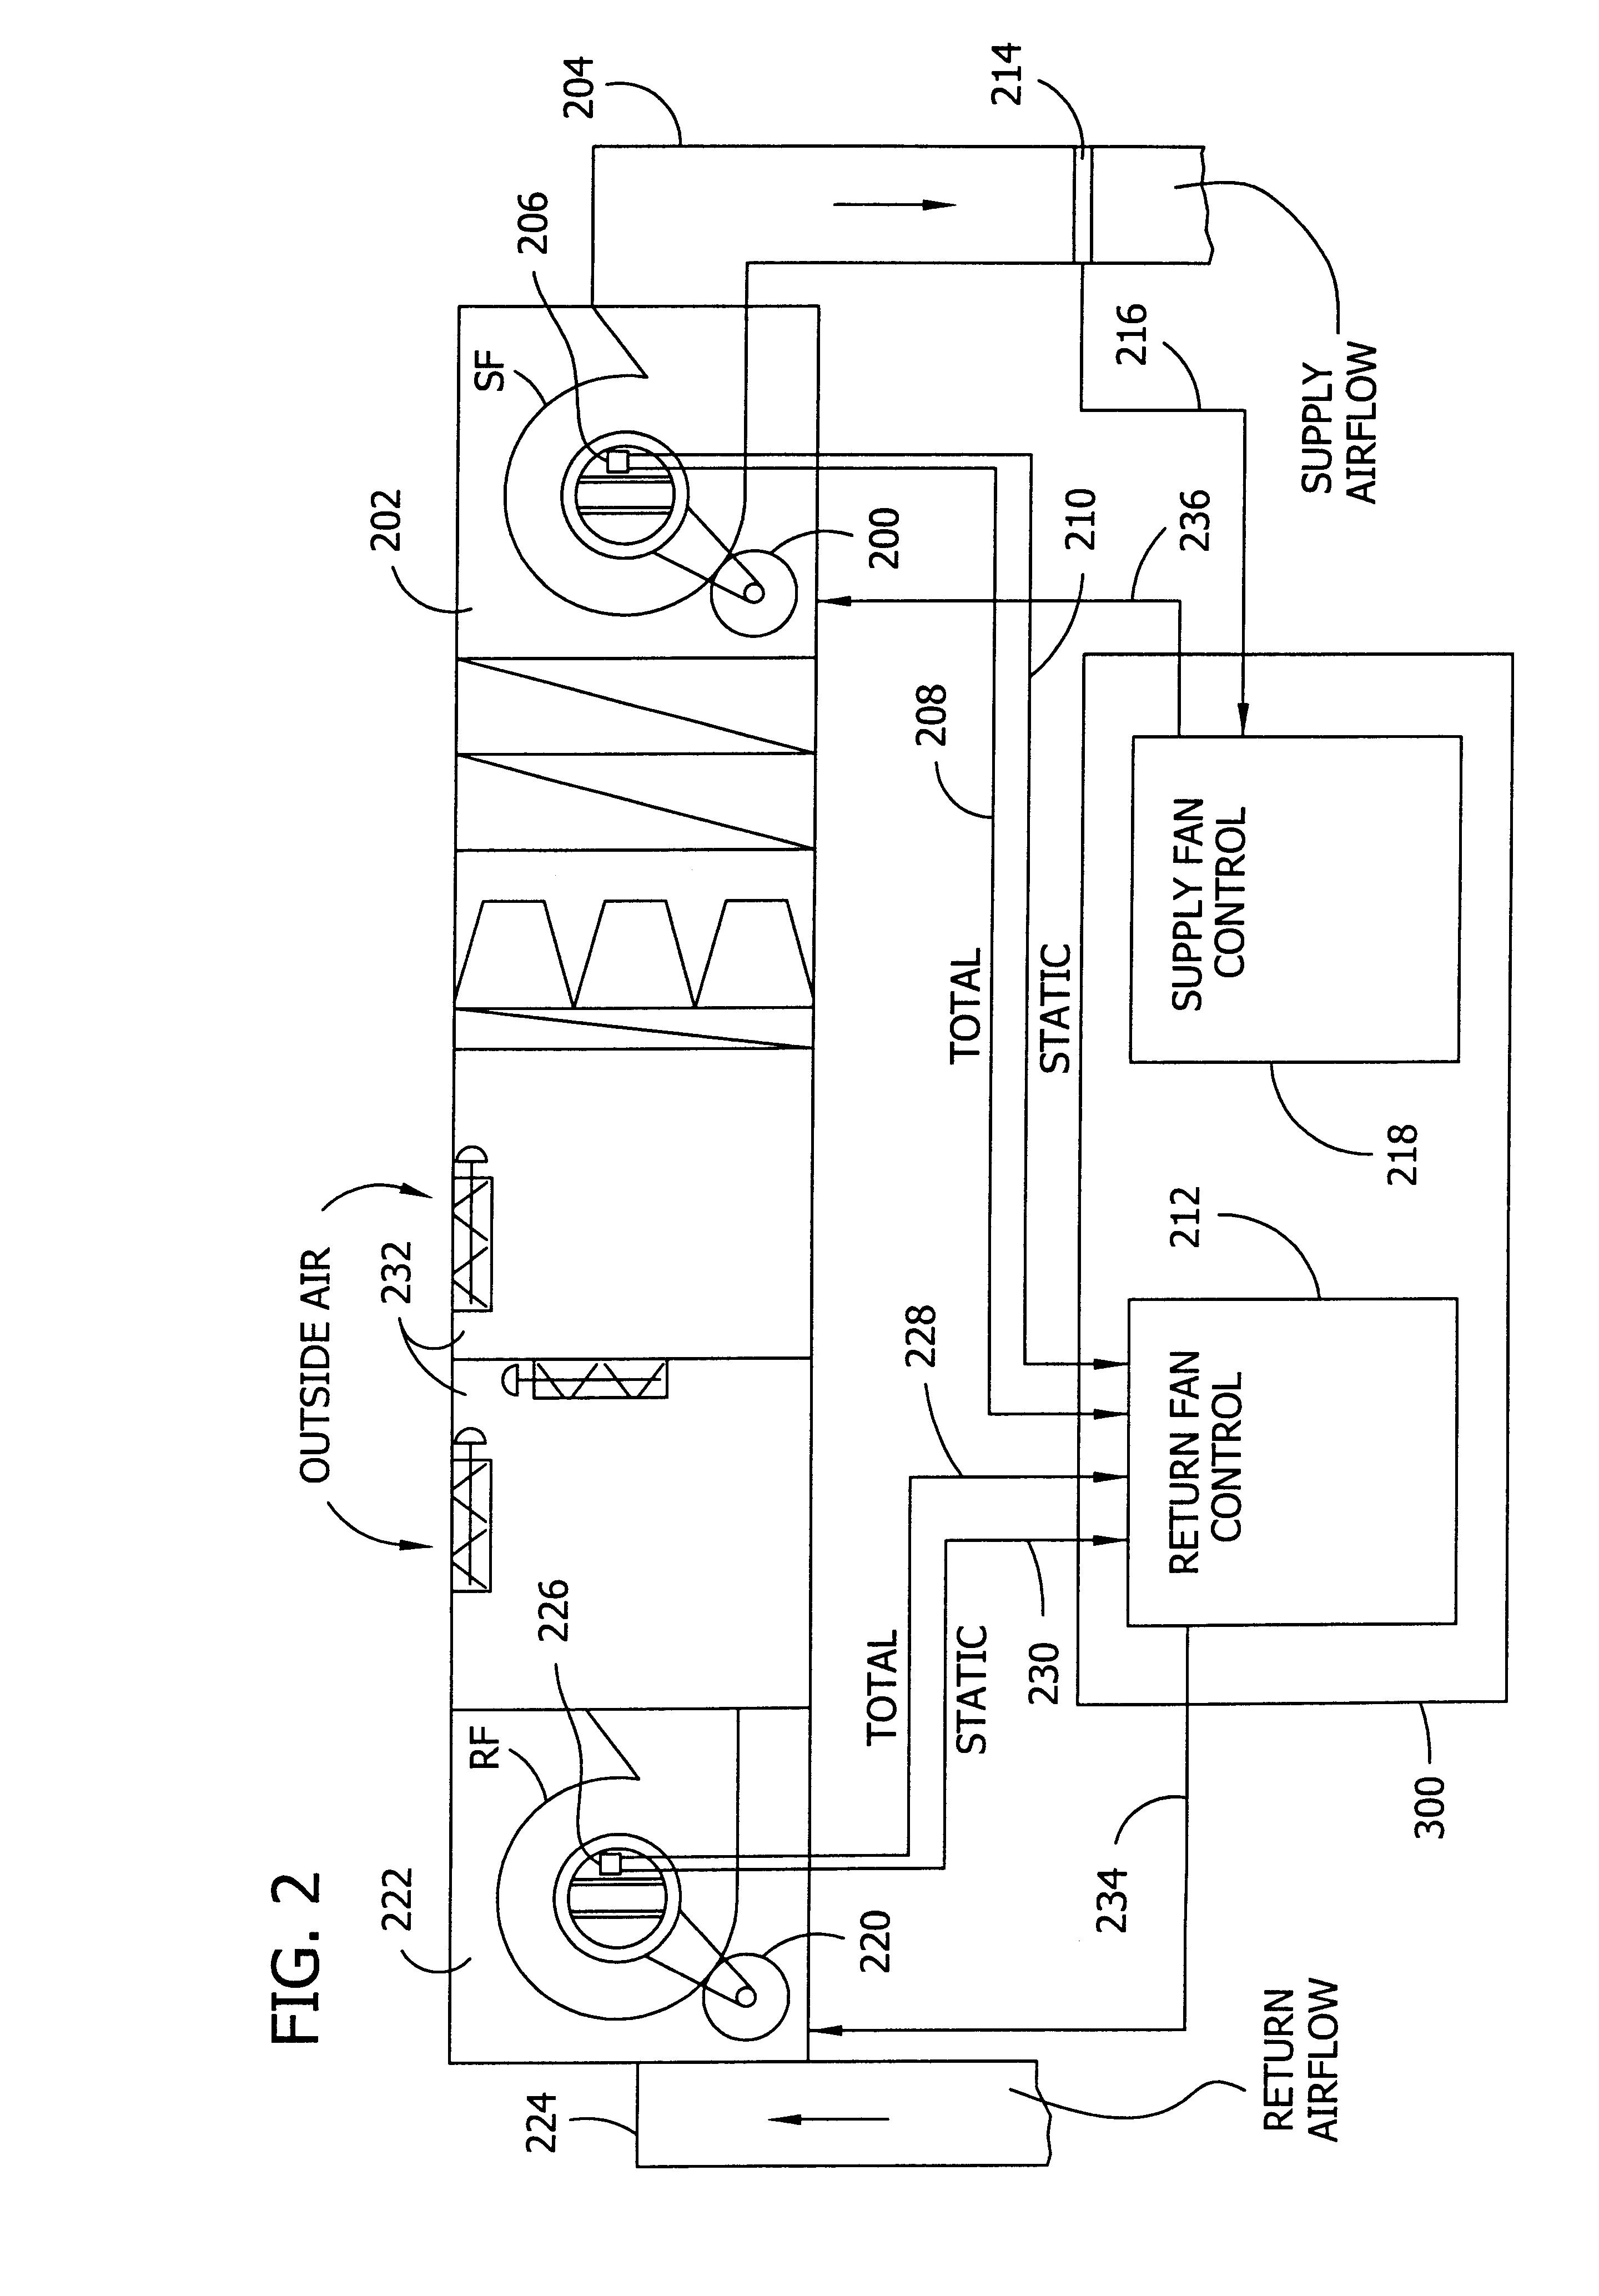 patent us6227961 - hvac custom control system